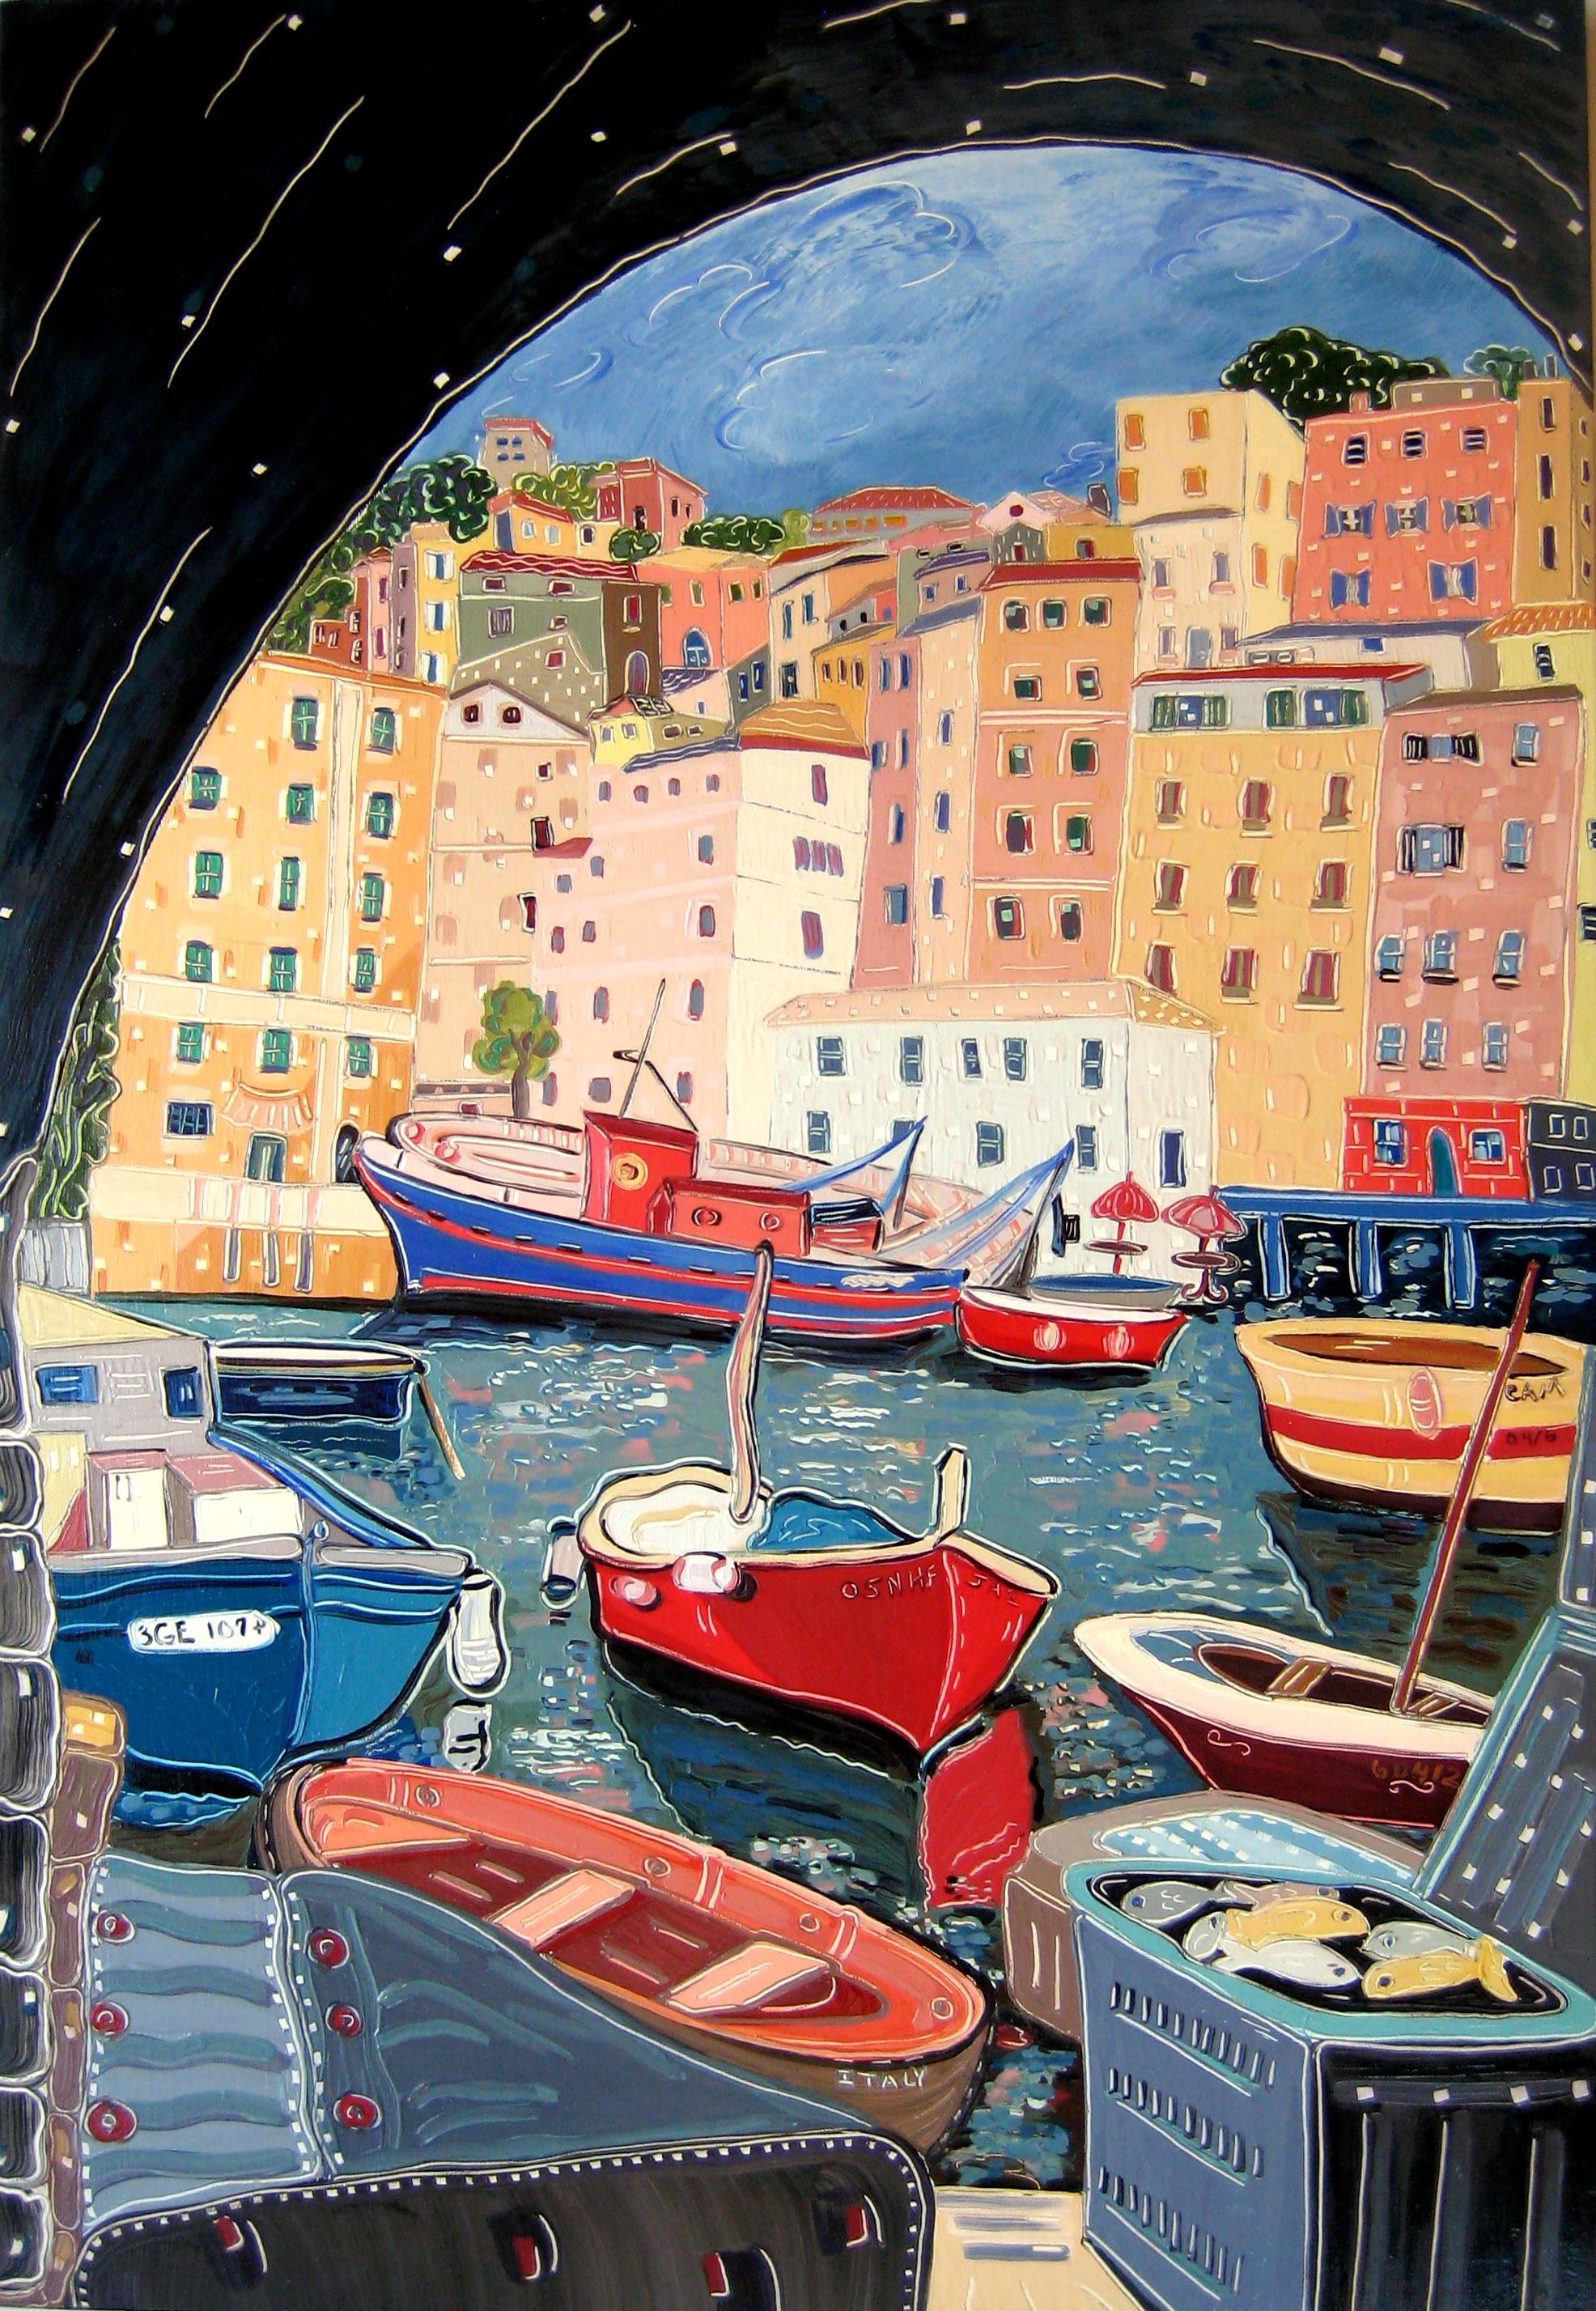 Through the Arch into Camogli , oil on panel, 32x22, $3,900